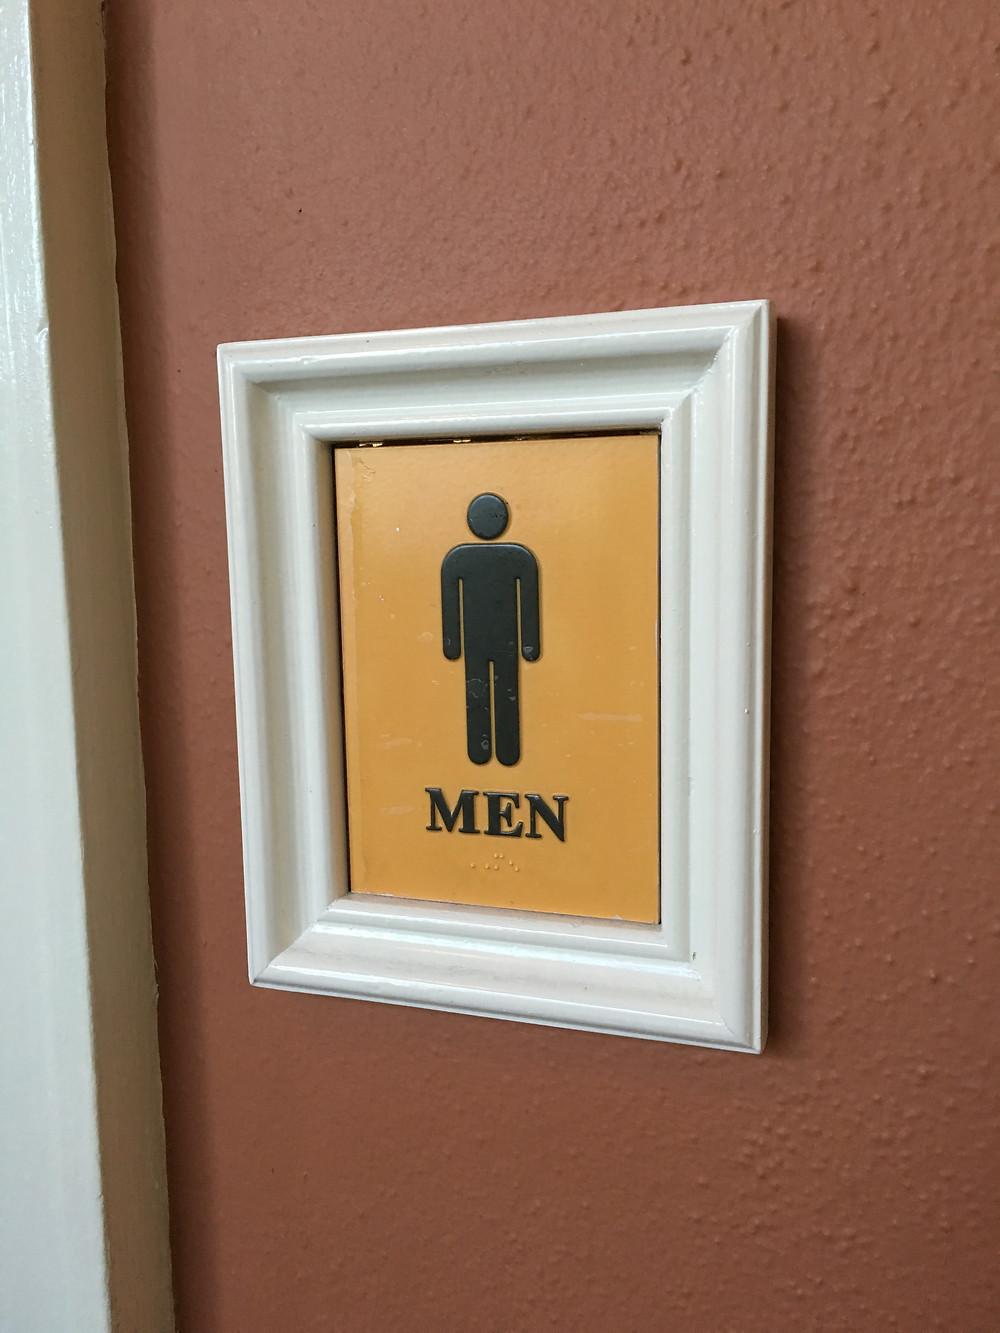 Men's Room Sign, Liberty Inn, American Adventure, EPCOT